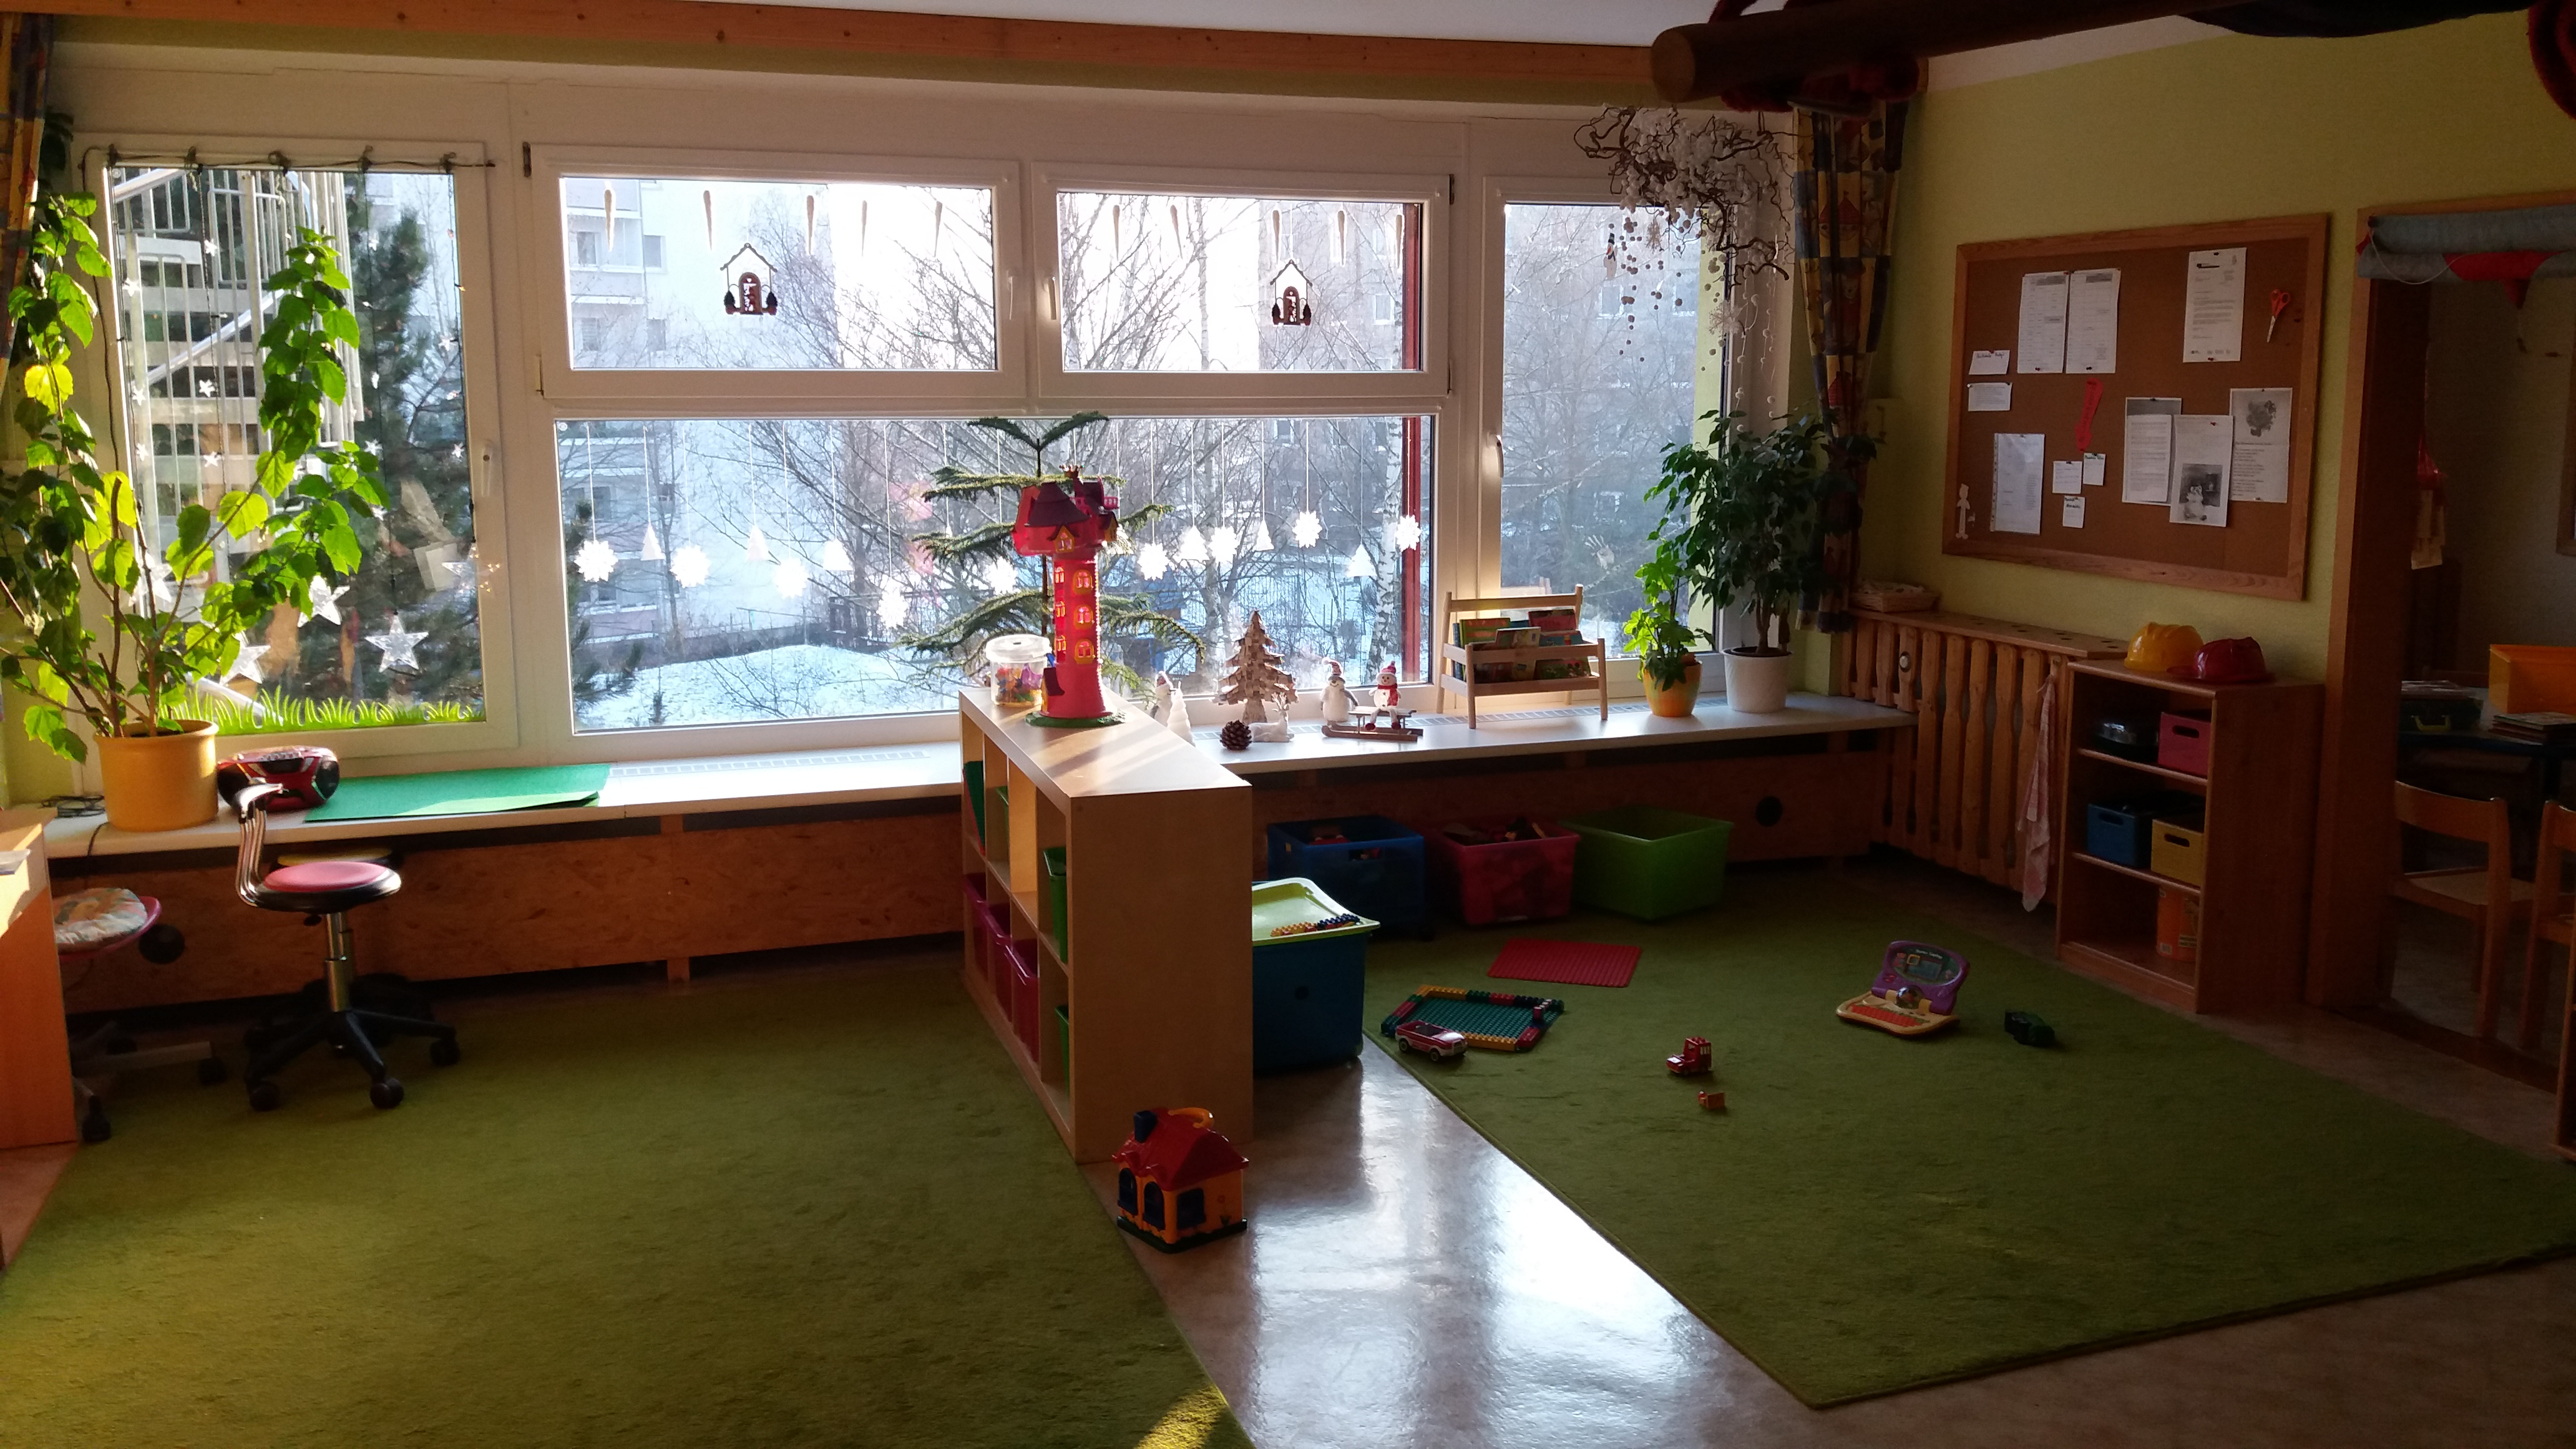 wirbelwind jena awo kreisverband jena weimar e v. Black Bedroom Furniture Sets. Home Design Ideas